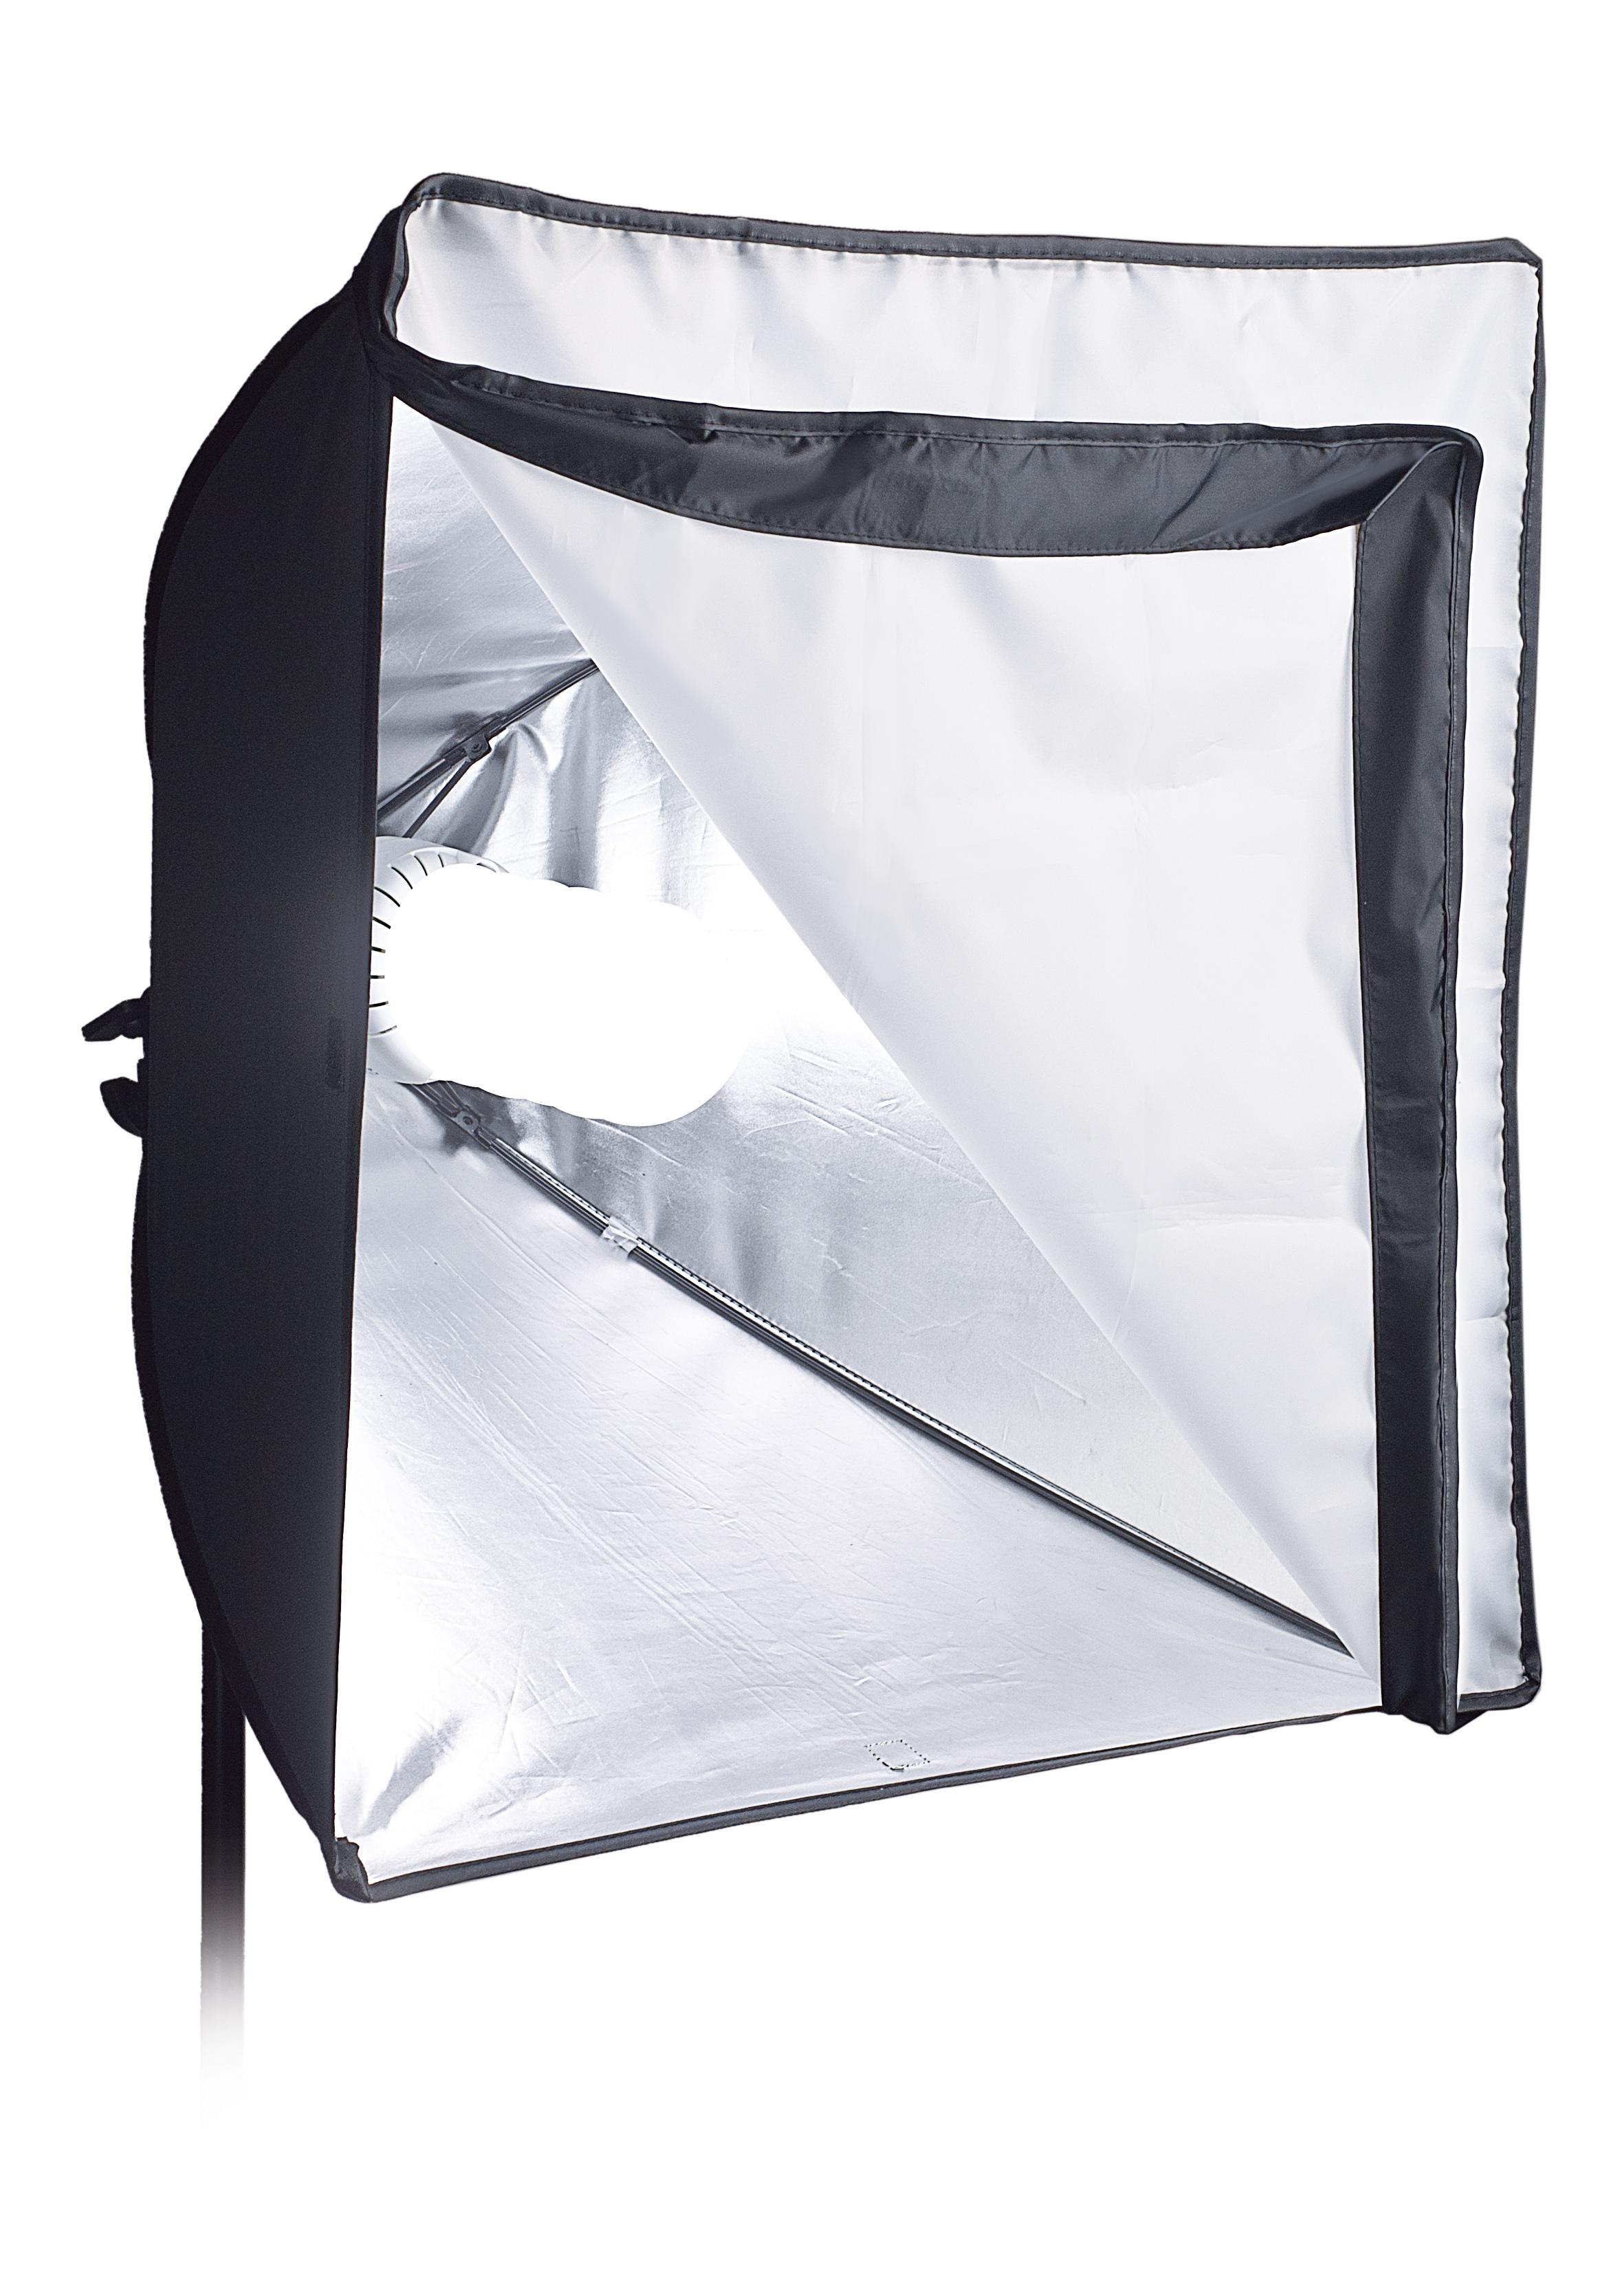 KAISER Tageslicht Beleuchtungs-Set studiolight E70 Kit